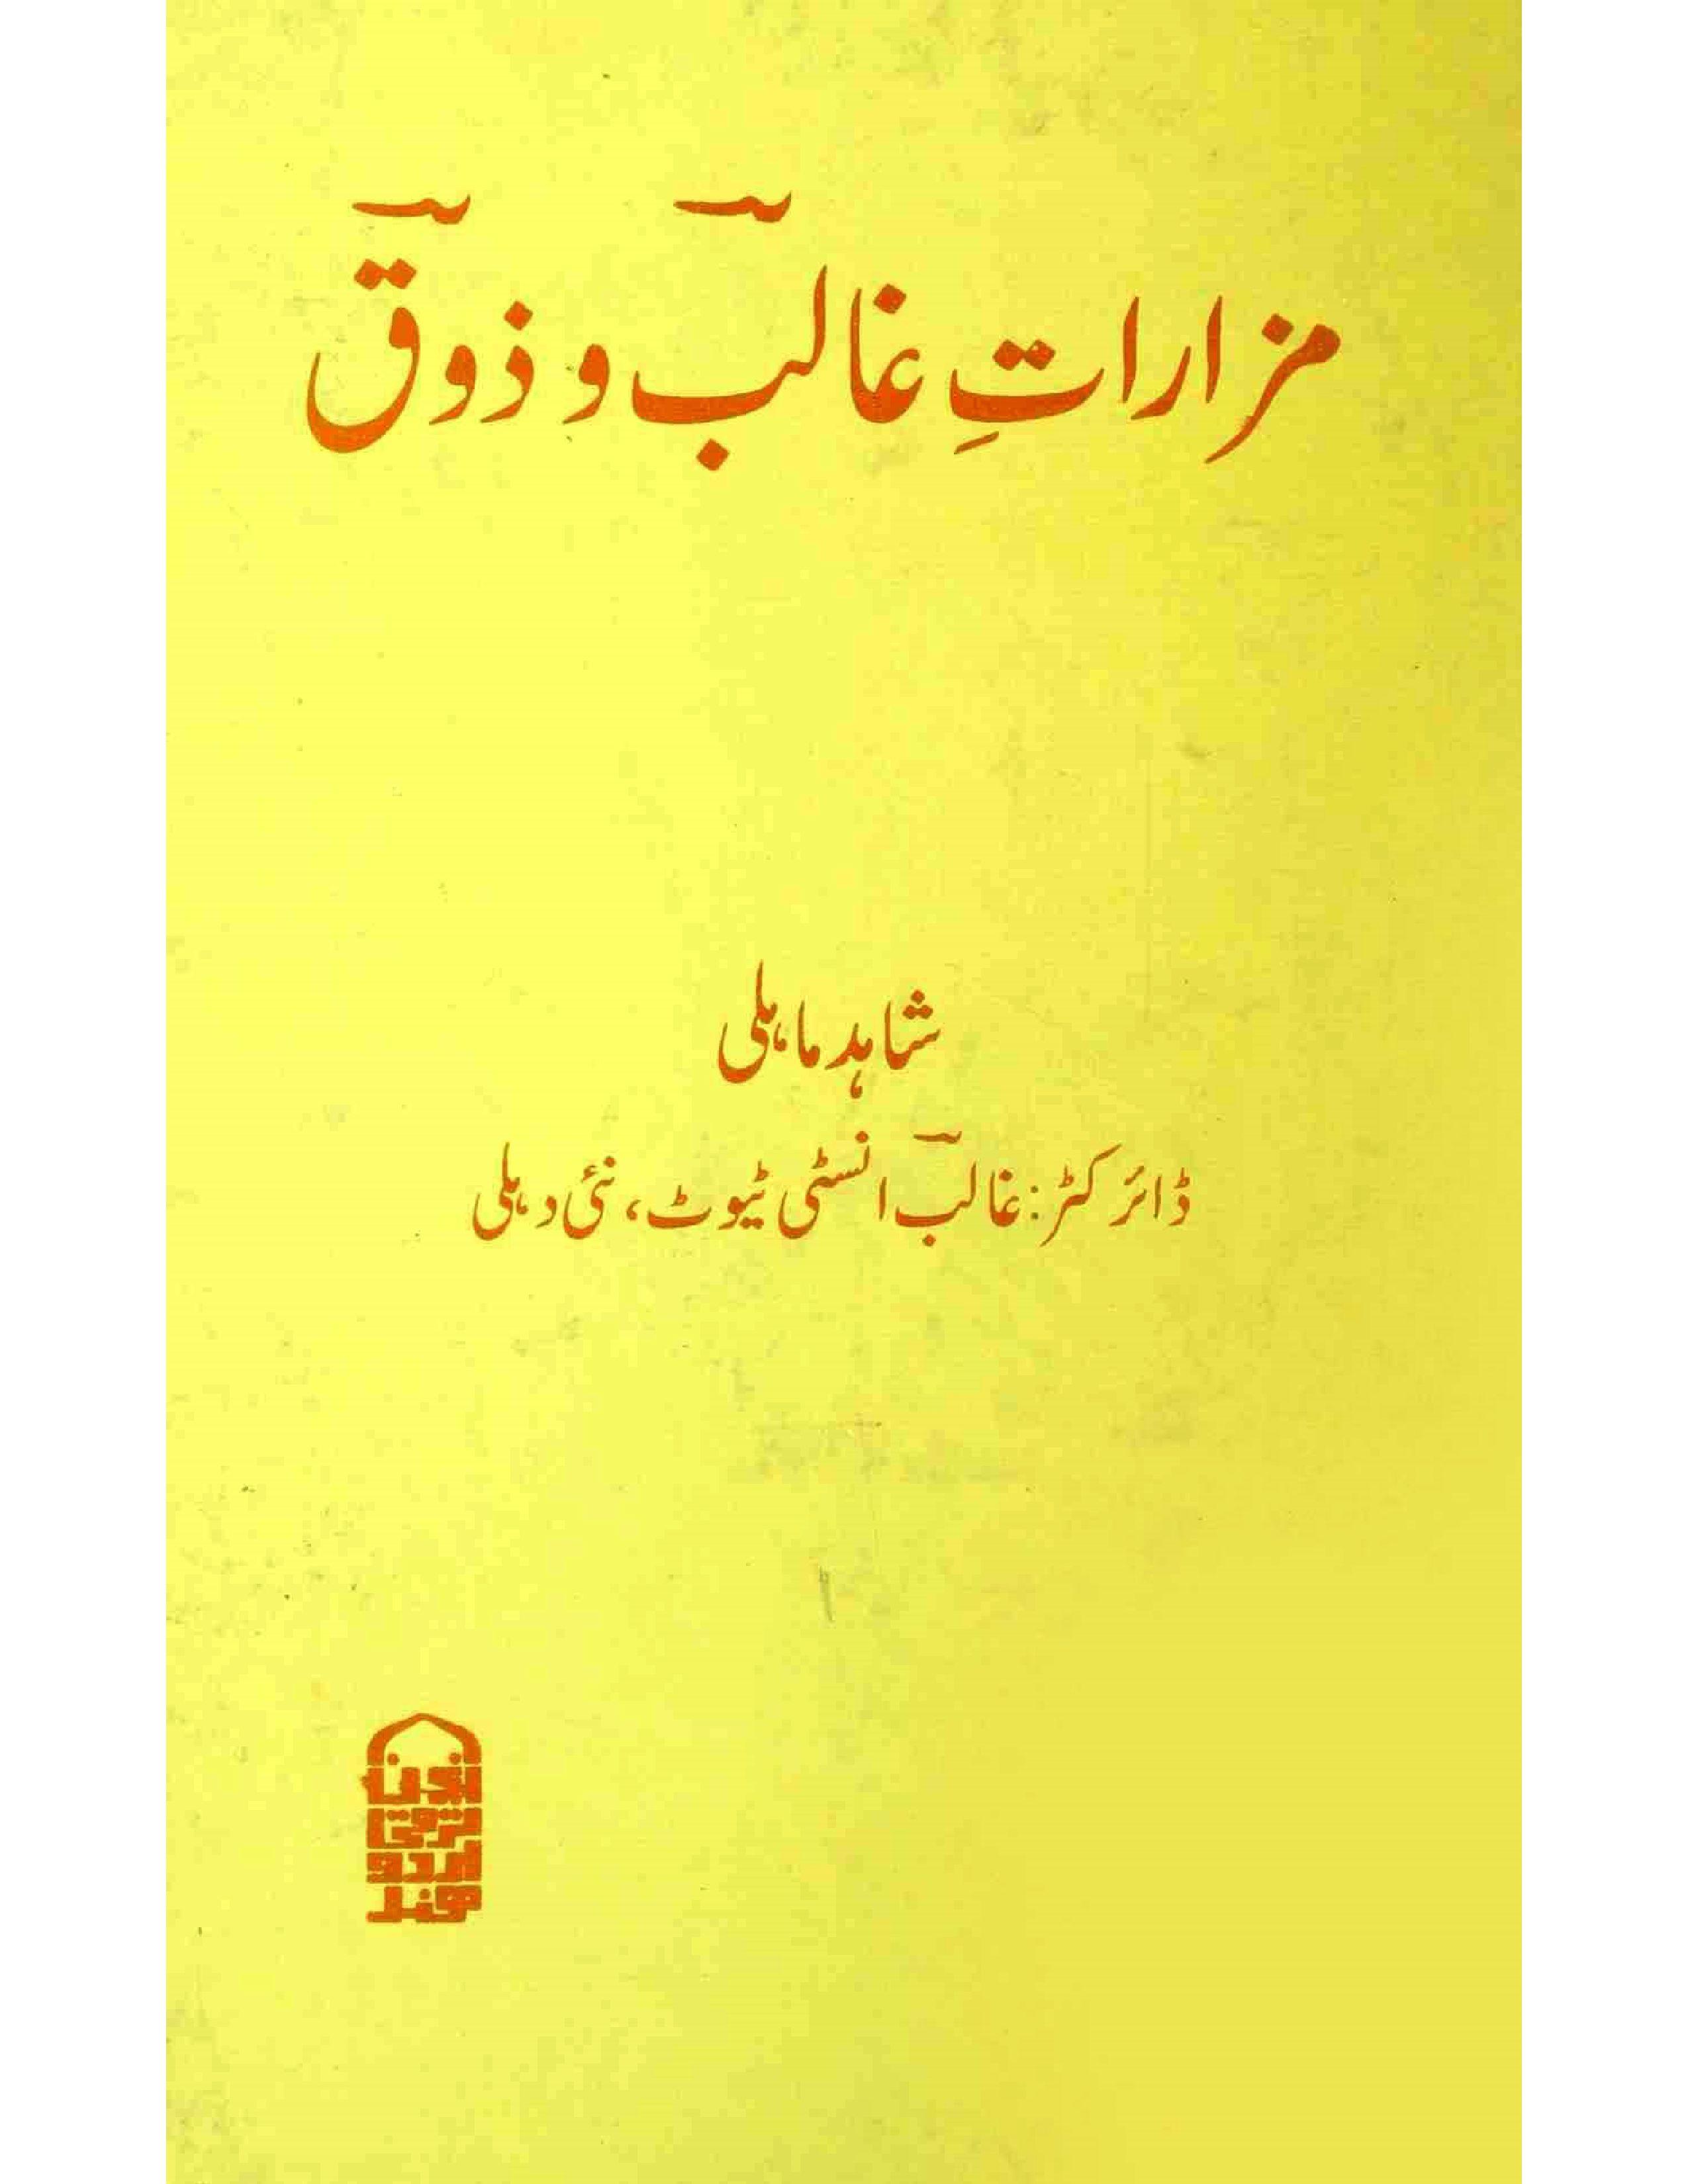 Mazarat-e-Ghalib-o-Zauq